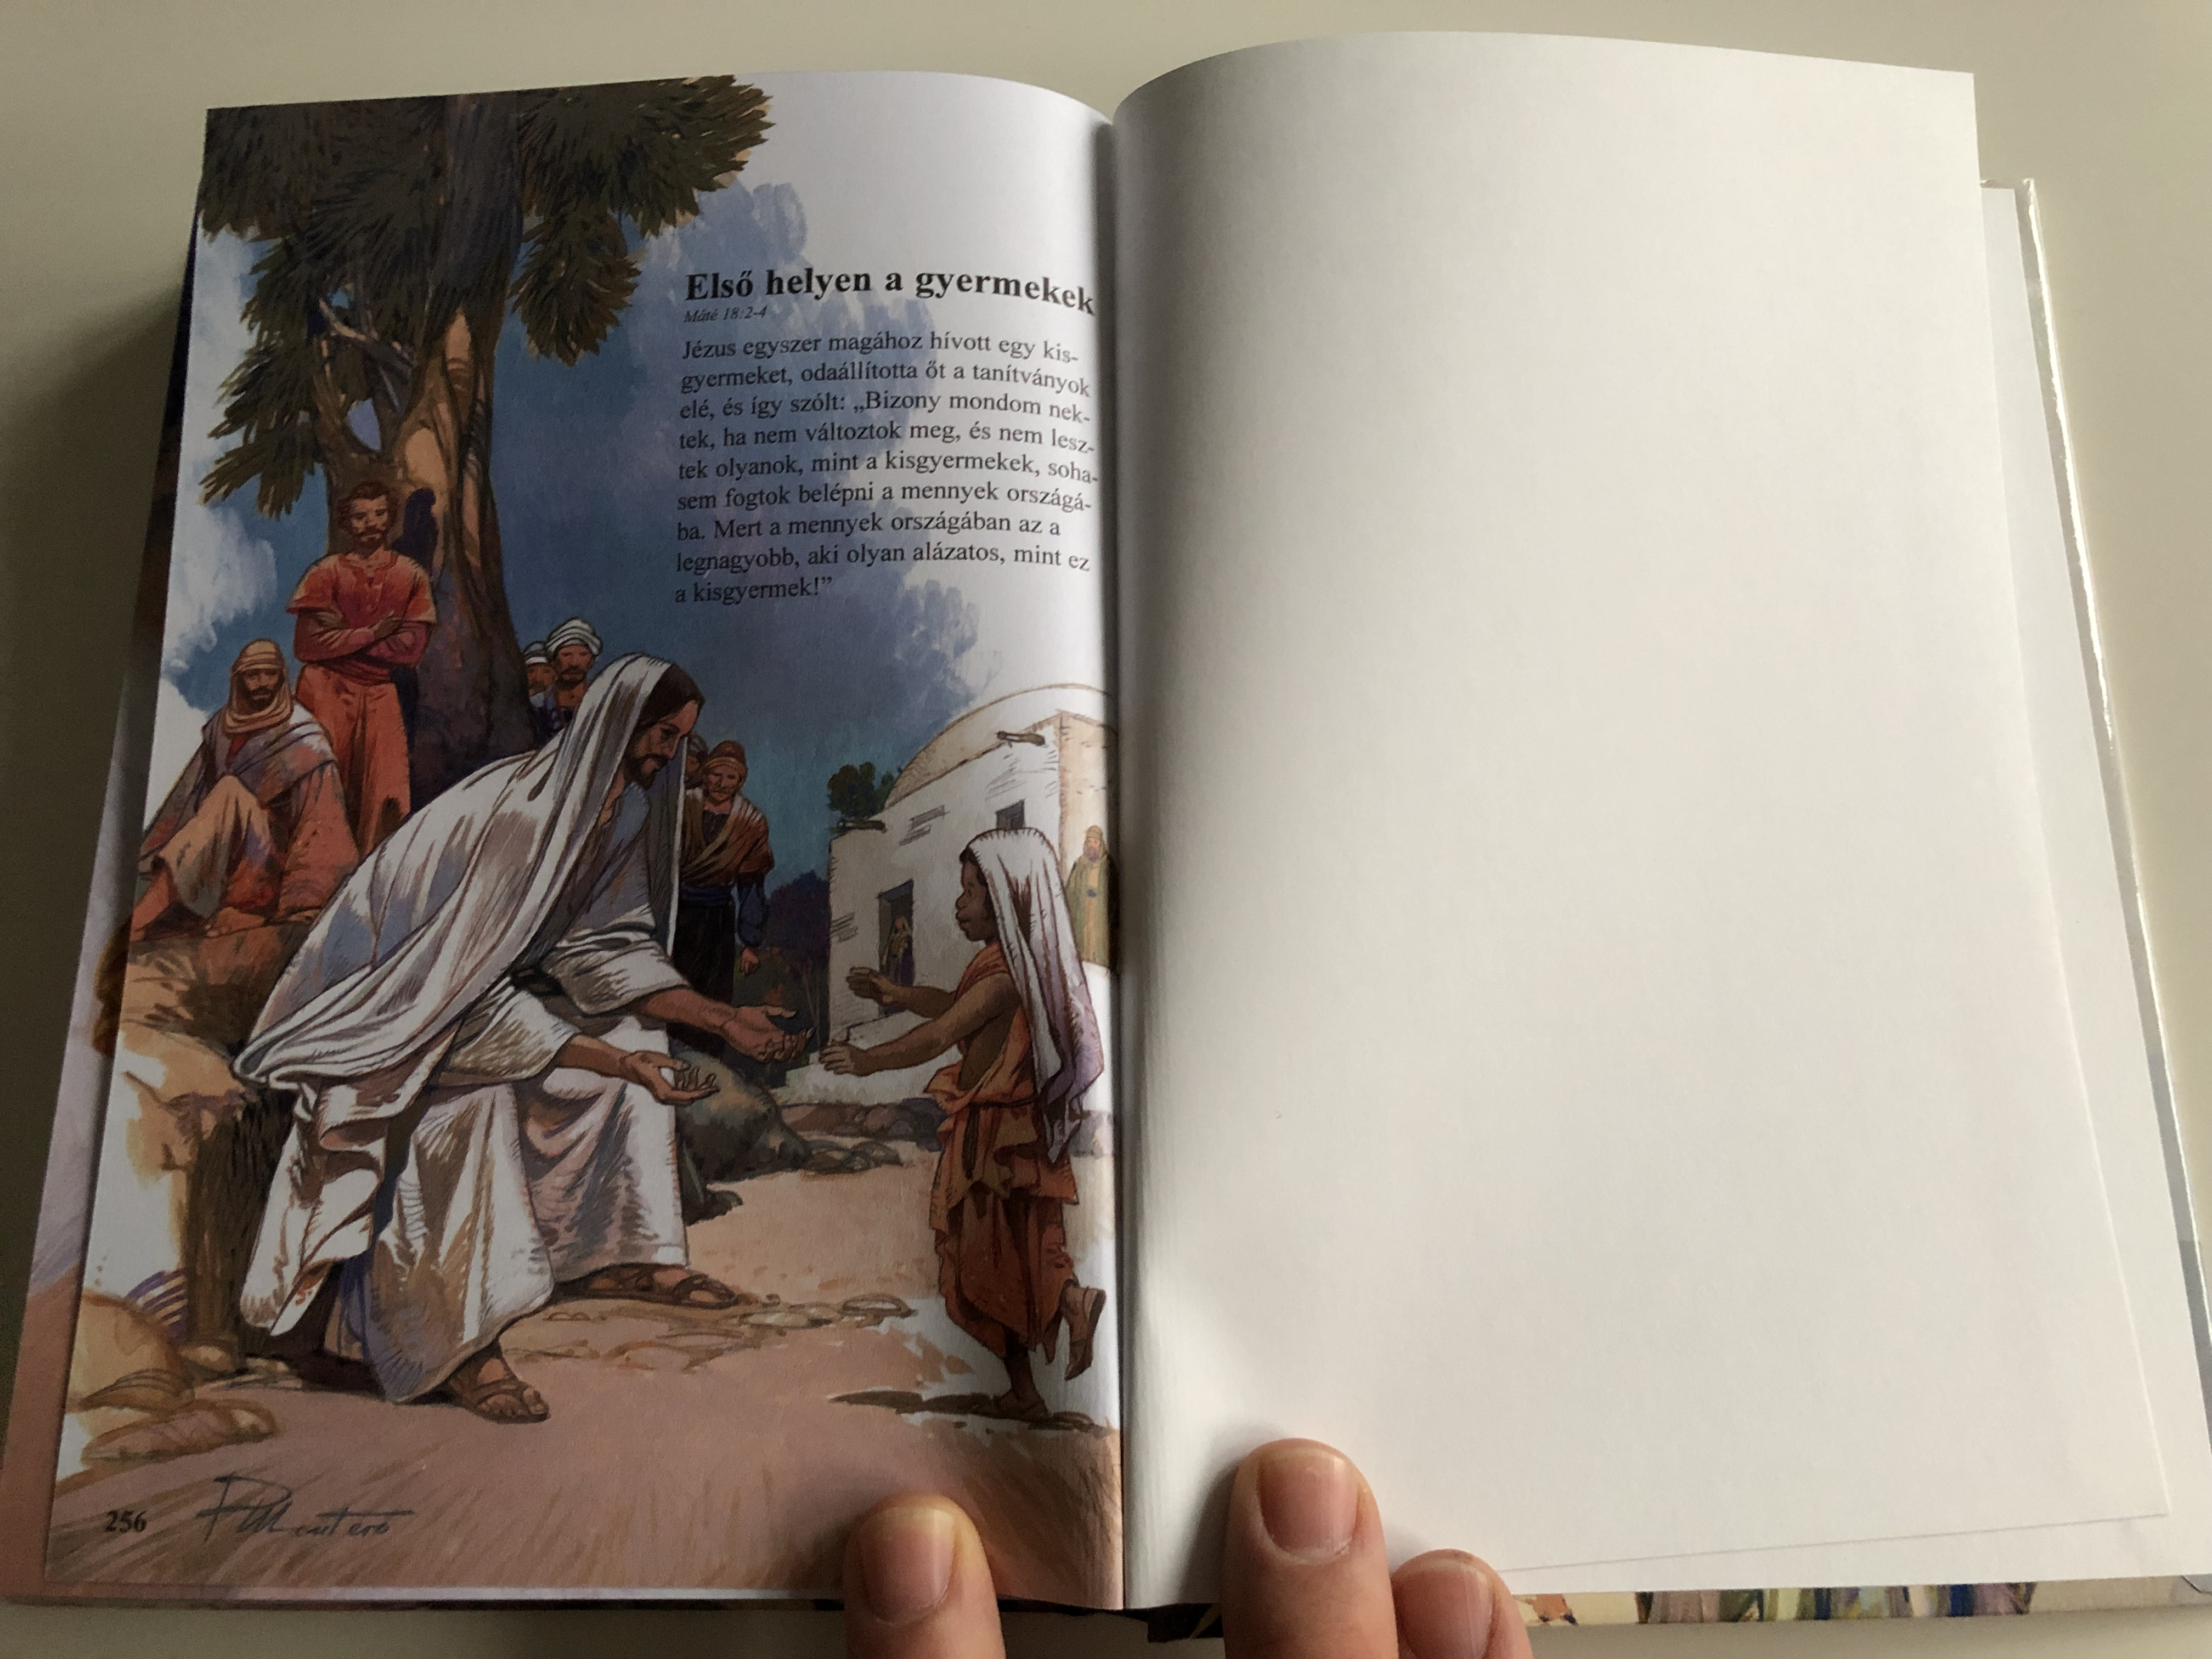 az-els-gyermekbibli-m-by-anne-de-graaf-hungarian-translation-of-the-children-s-bible-illustrations-by-jos-p-rez-montero-hardcover-2006-tbl-hungary-4-.jpg